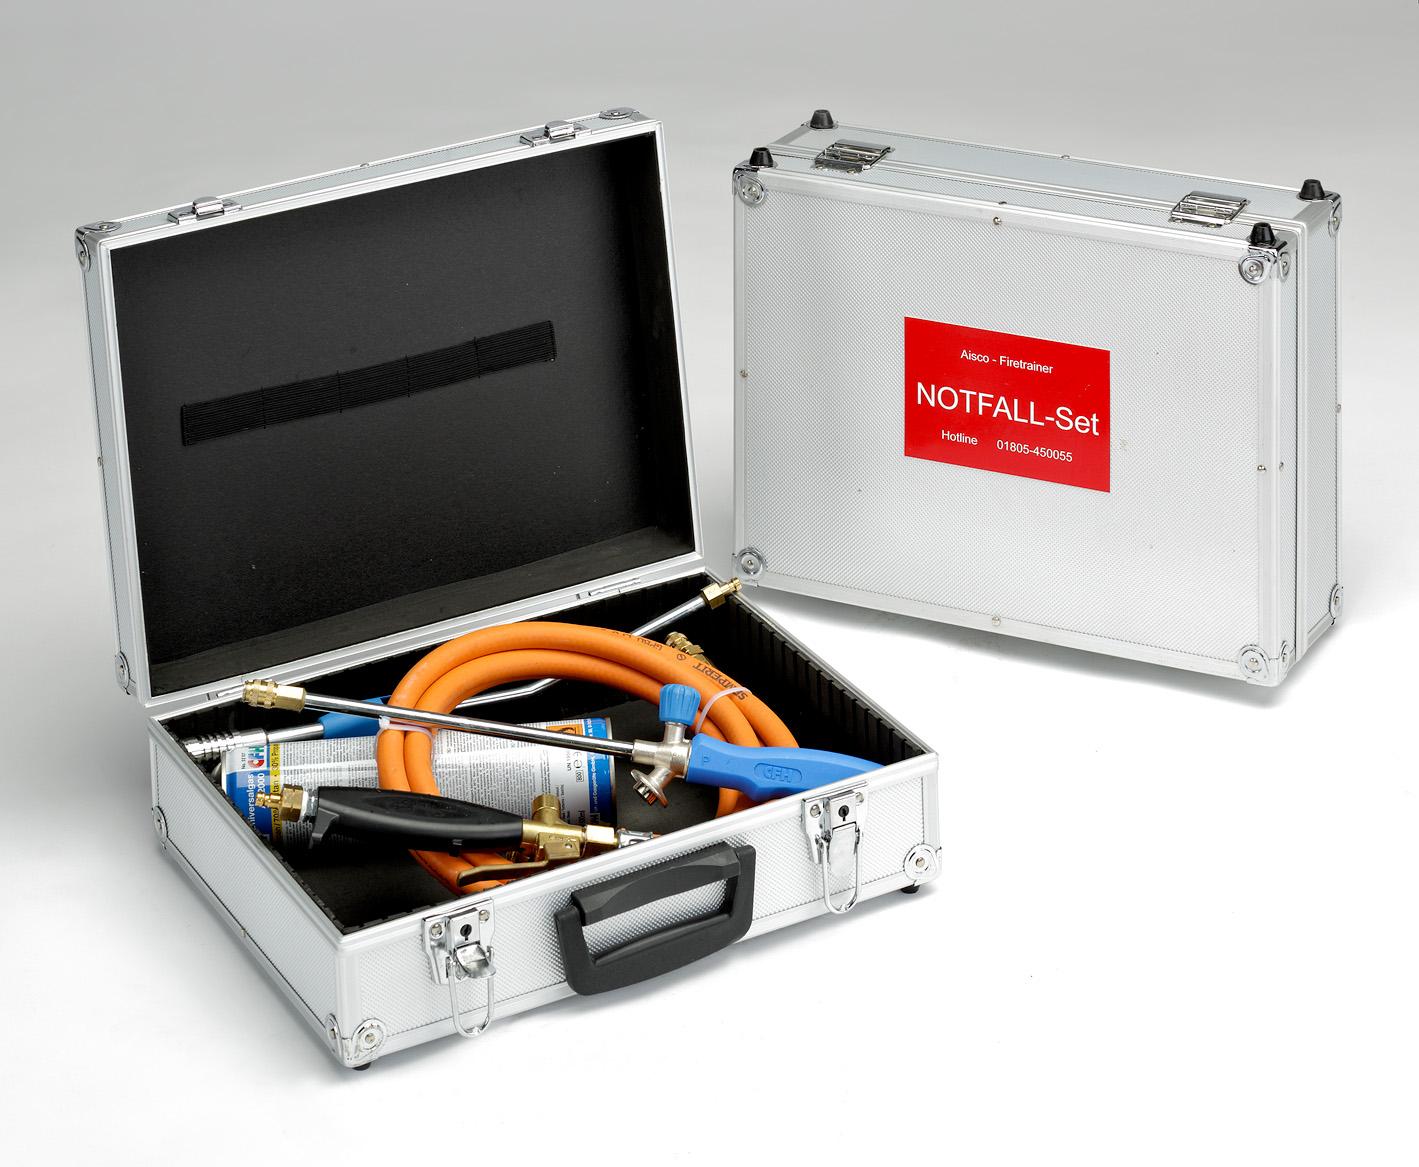 Aisco firetrainer e 100 aisco firetrainer gmbh for Reihengarderobenstander gebraucht